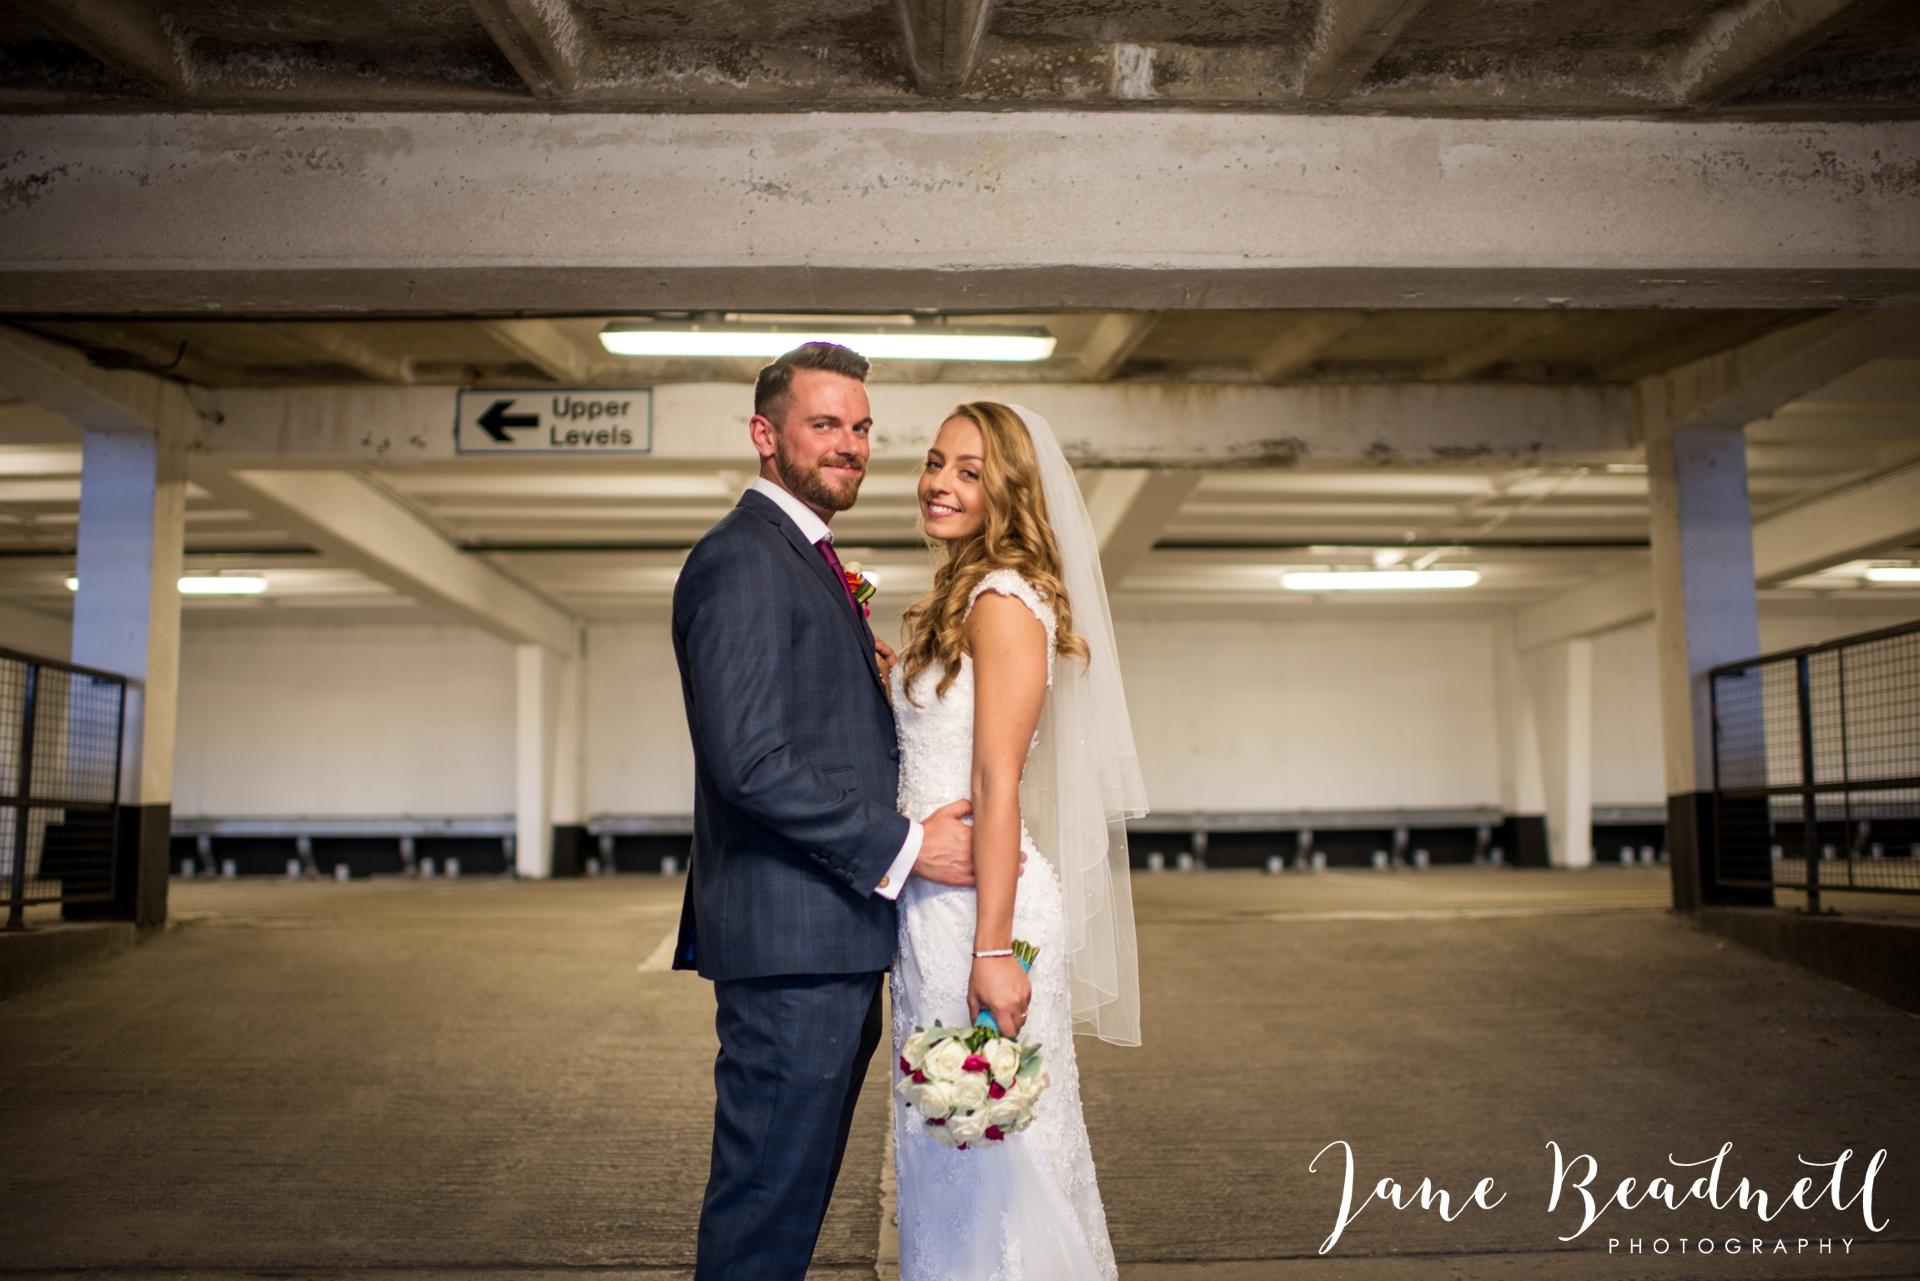 Jane Beadnell fine art wedding photographer Harrogate_0007